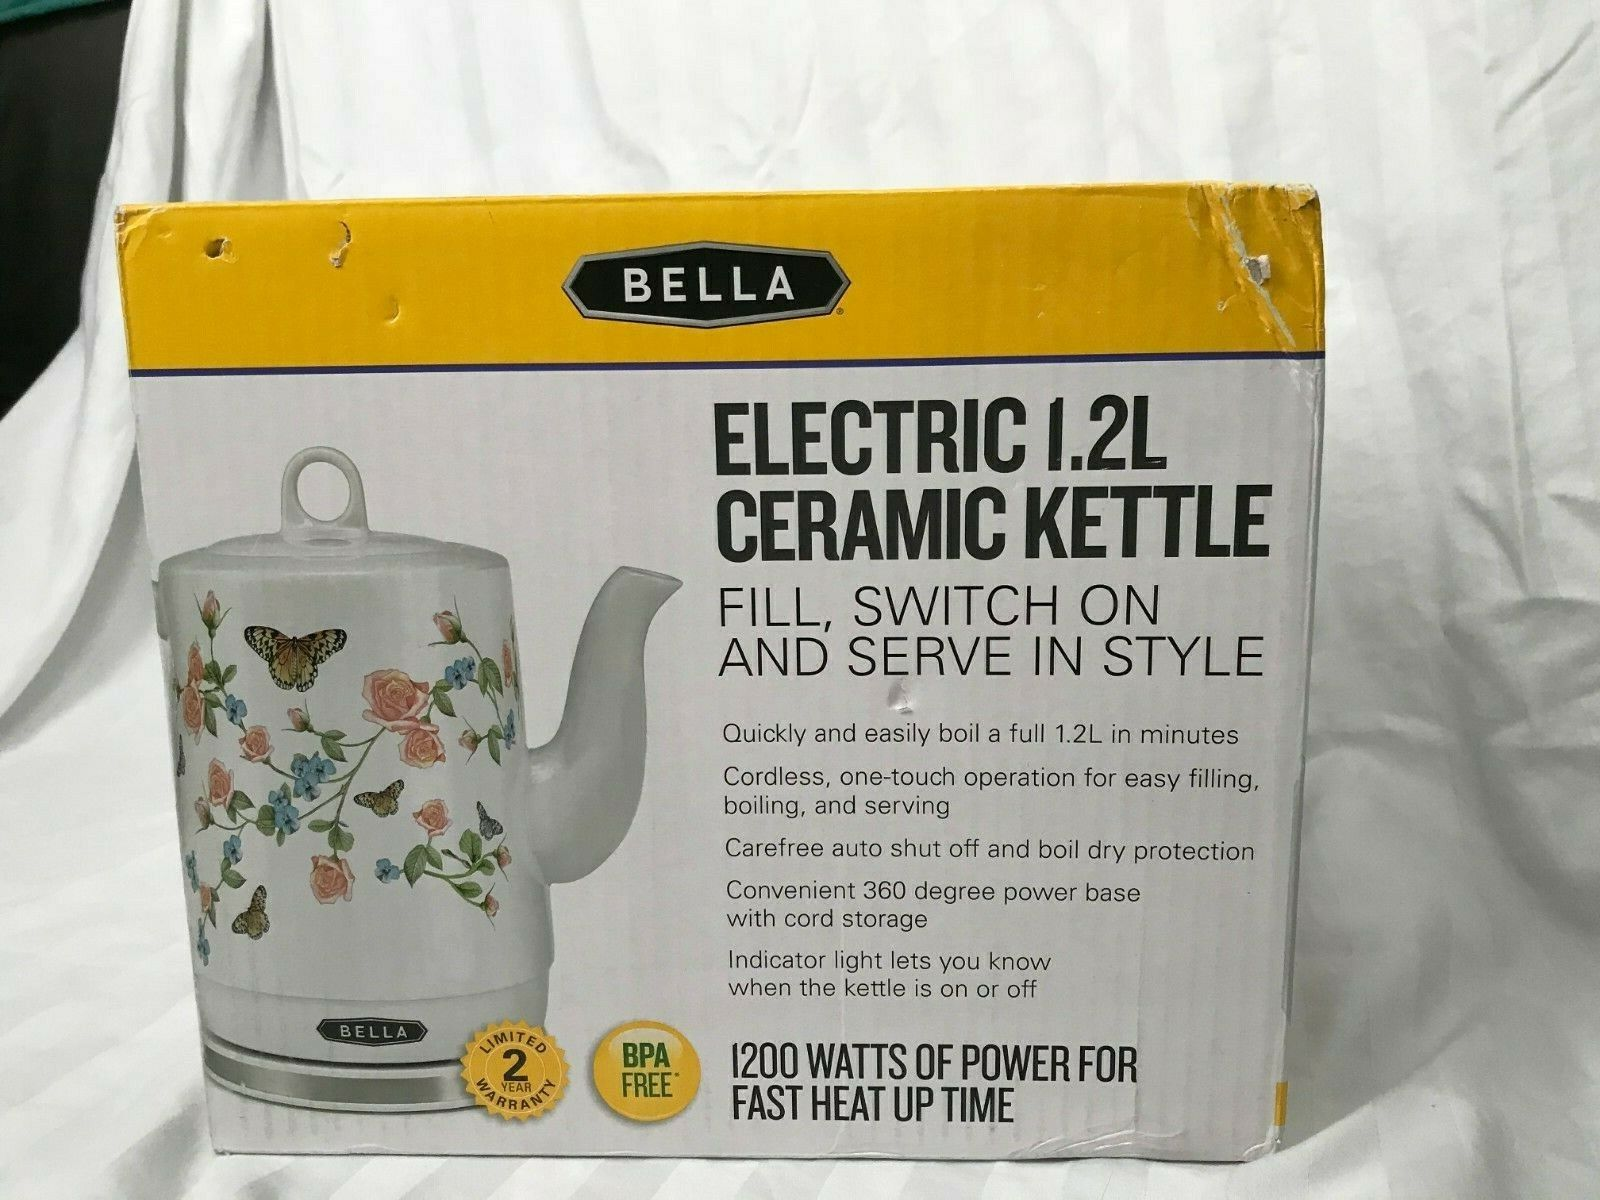 BRAND NEW Bella Electric Tea Pot Ceramic Kettle 1.2 liter In